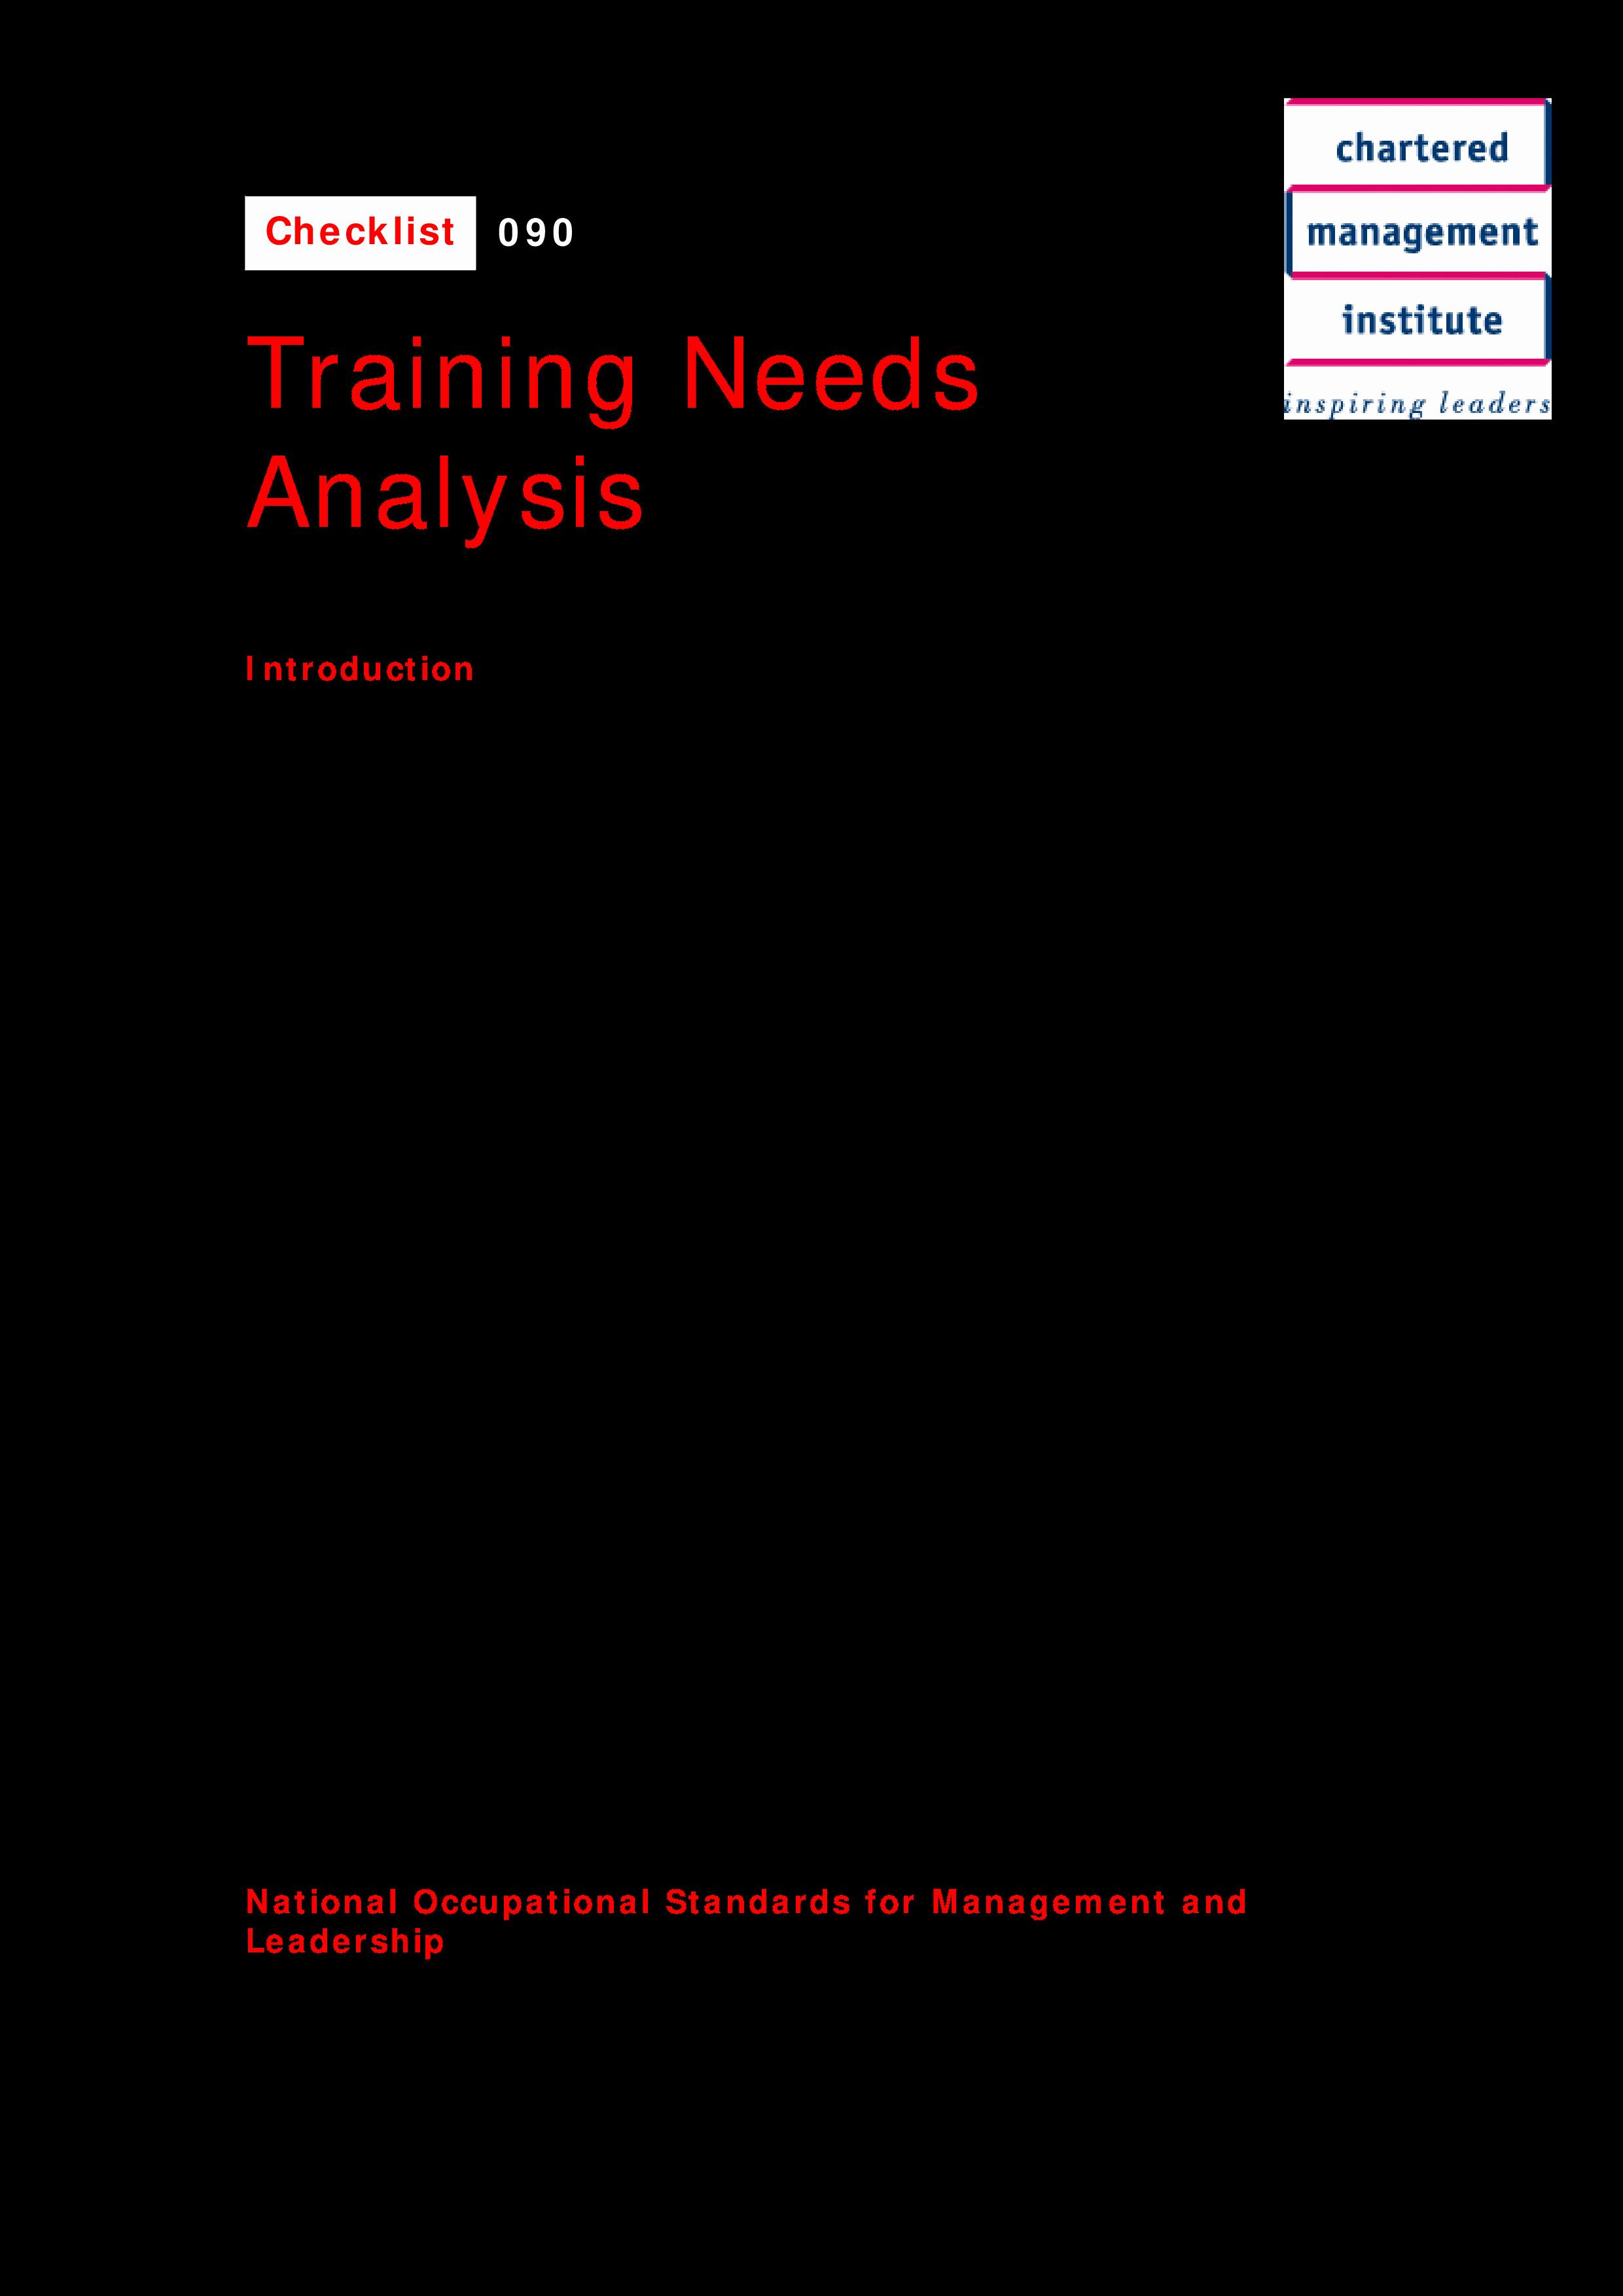 Training Needs Analysis Template Best Of Training Needs Analysis